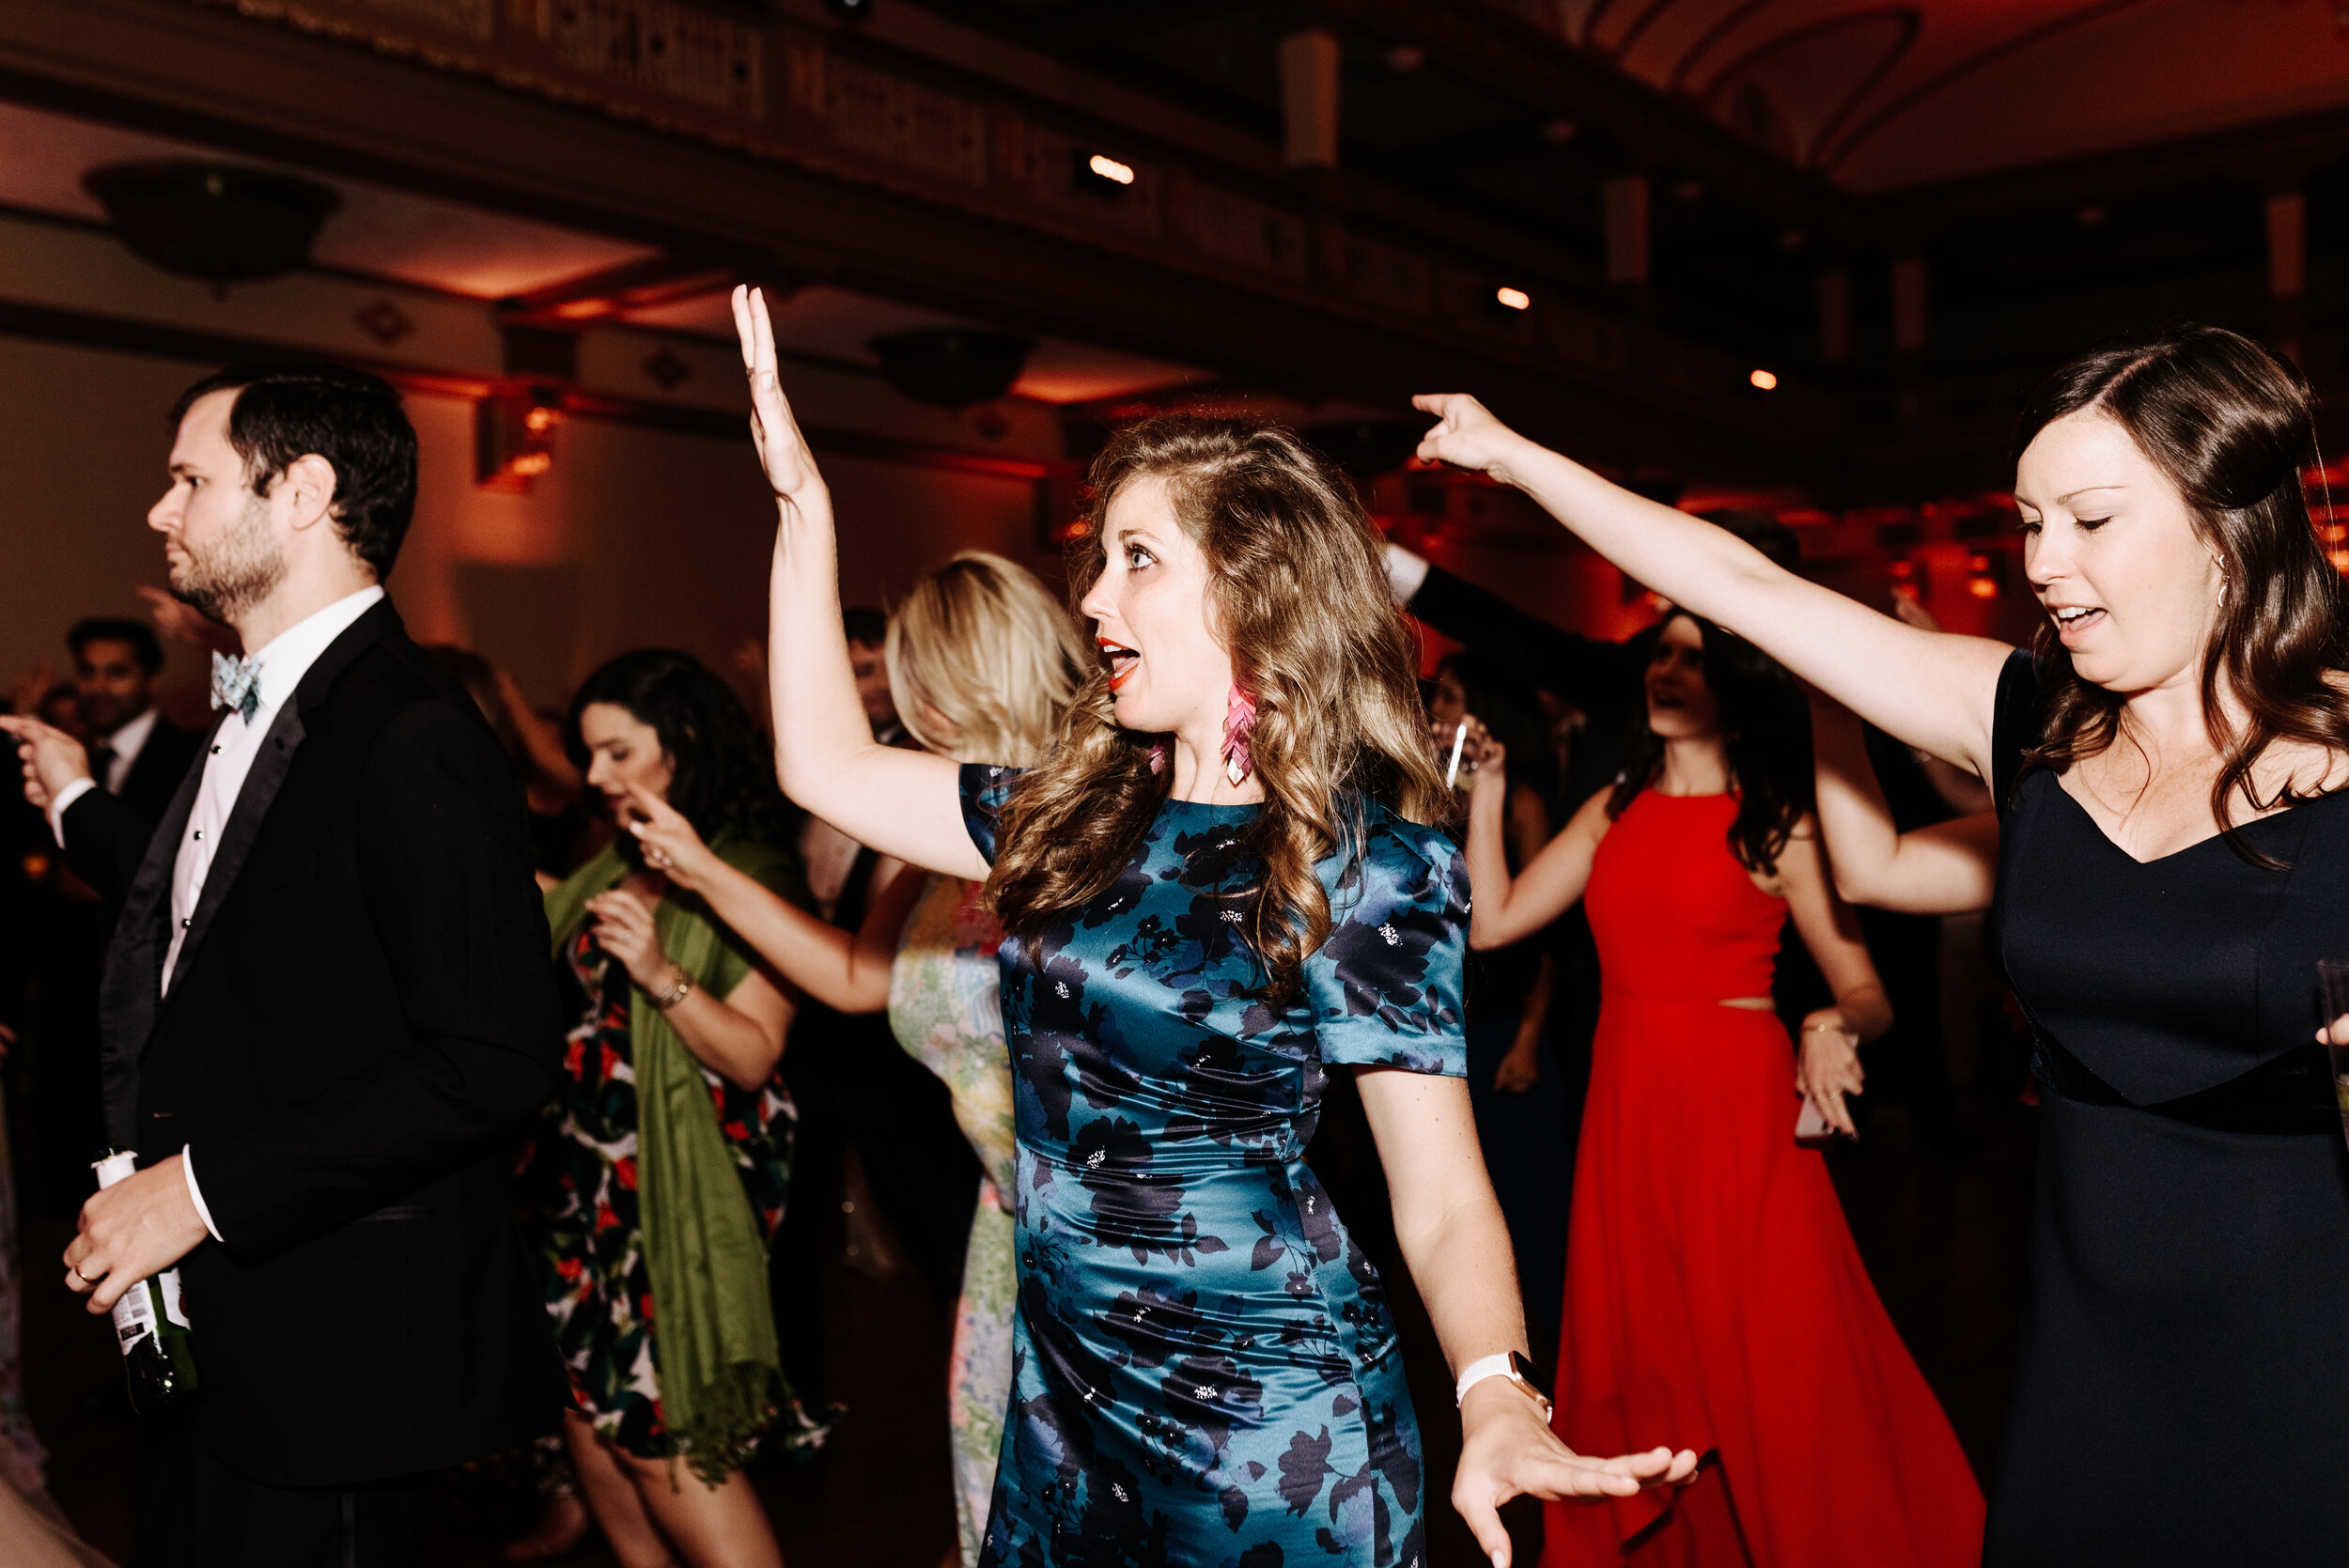 Cassie-Mrunal-Wedding-Quirk-Hotel-John-Marshall-Ballrooms-Richmond-Virginia-Photography-by-V-107.jpg